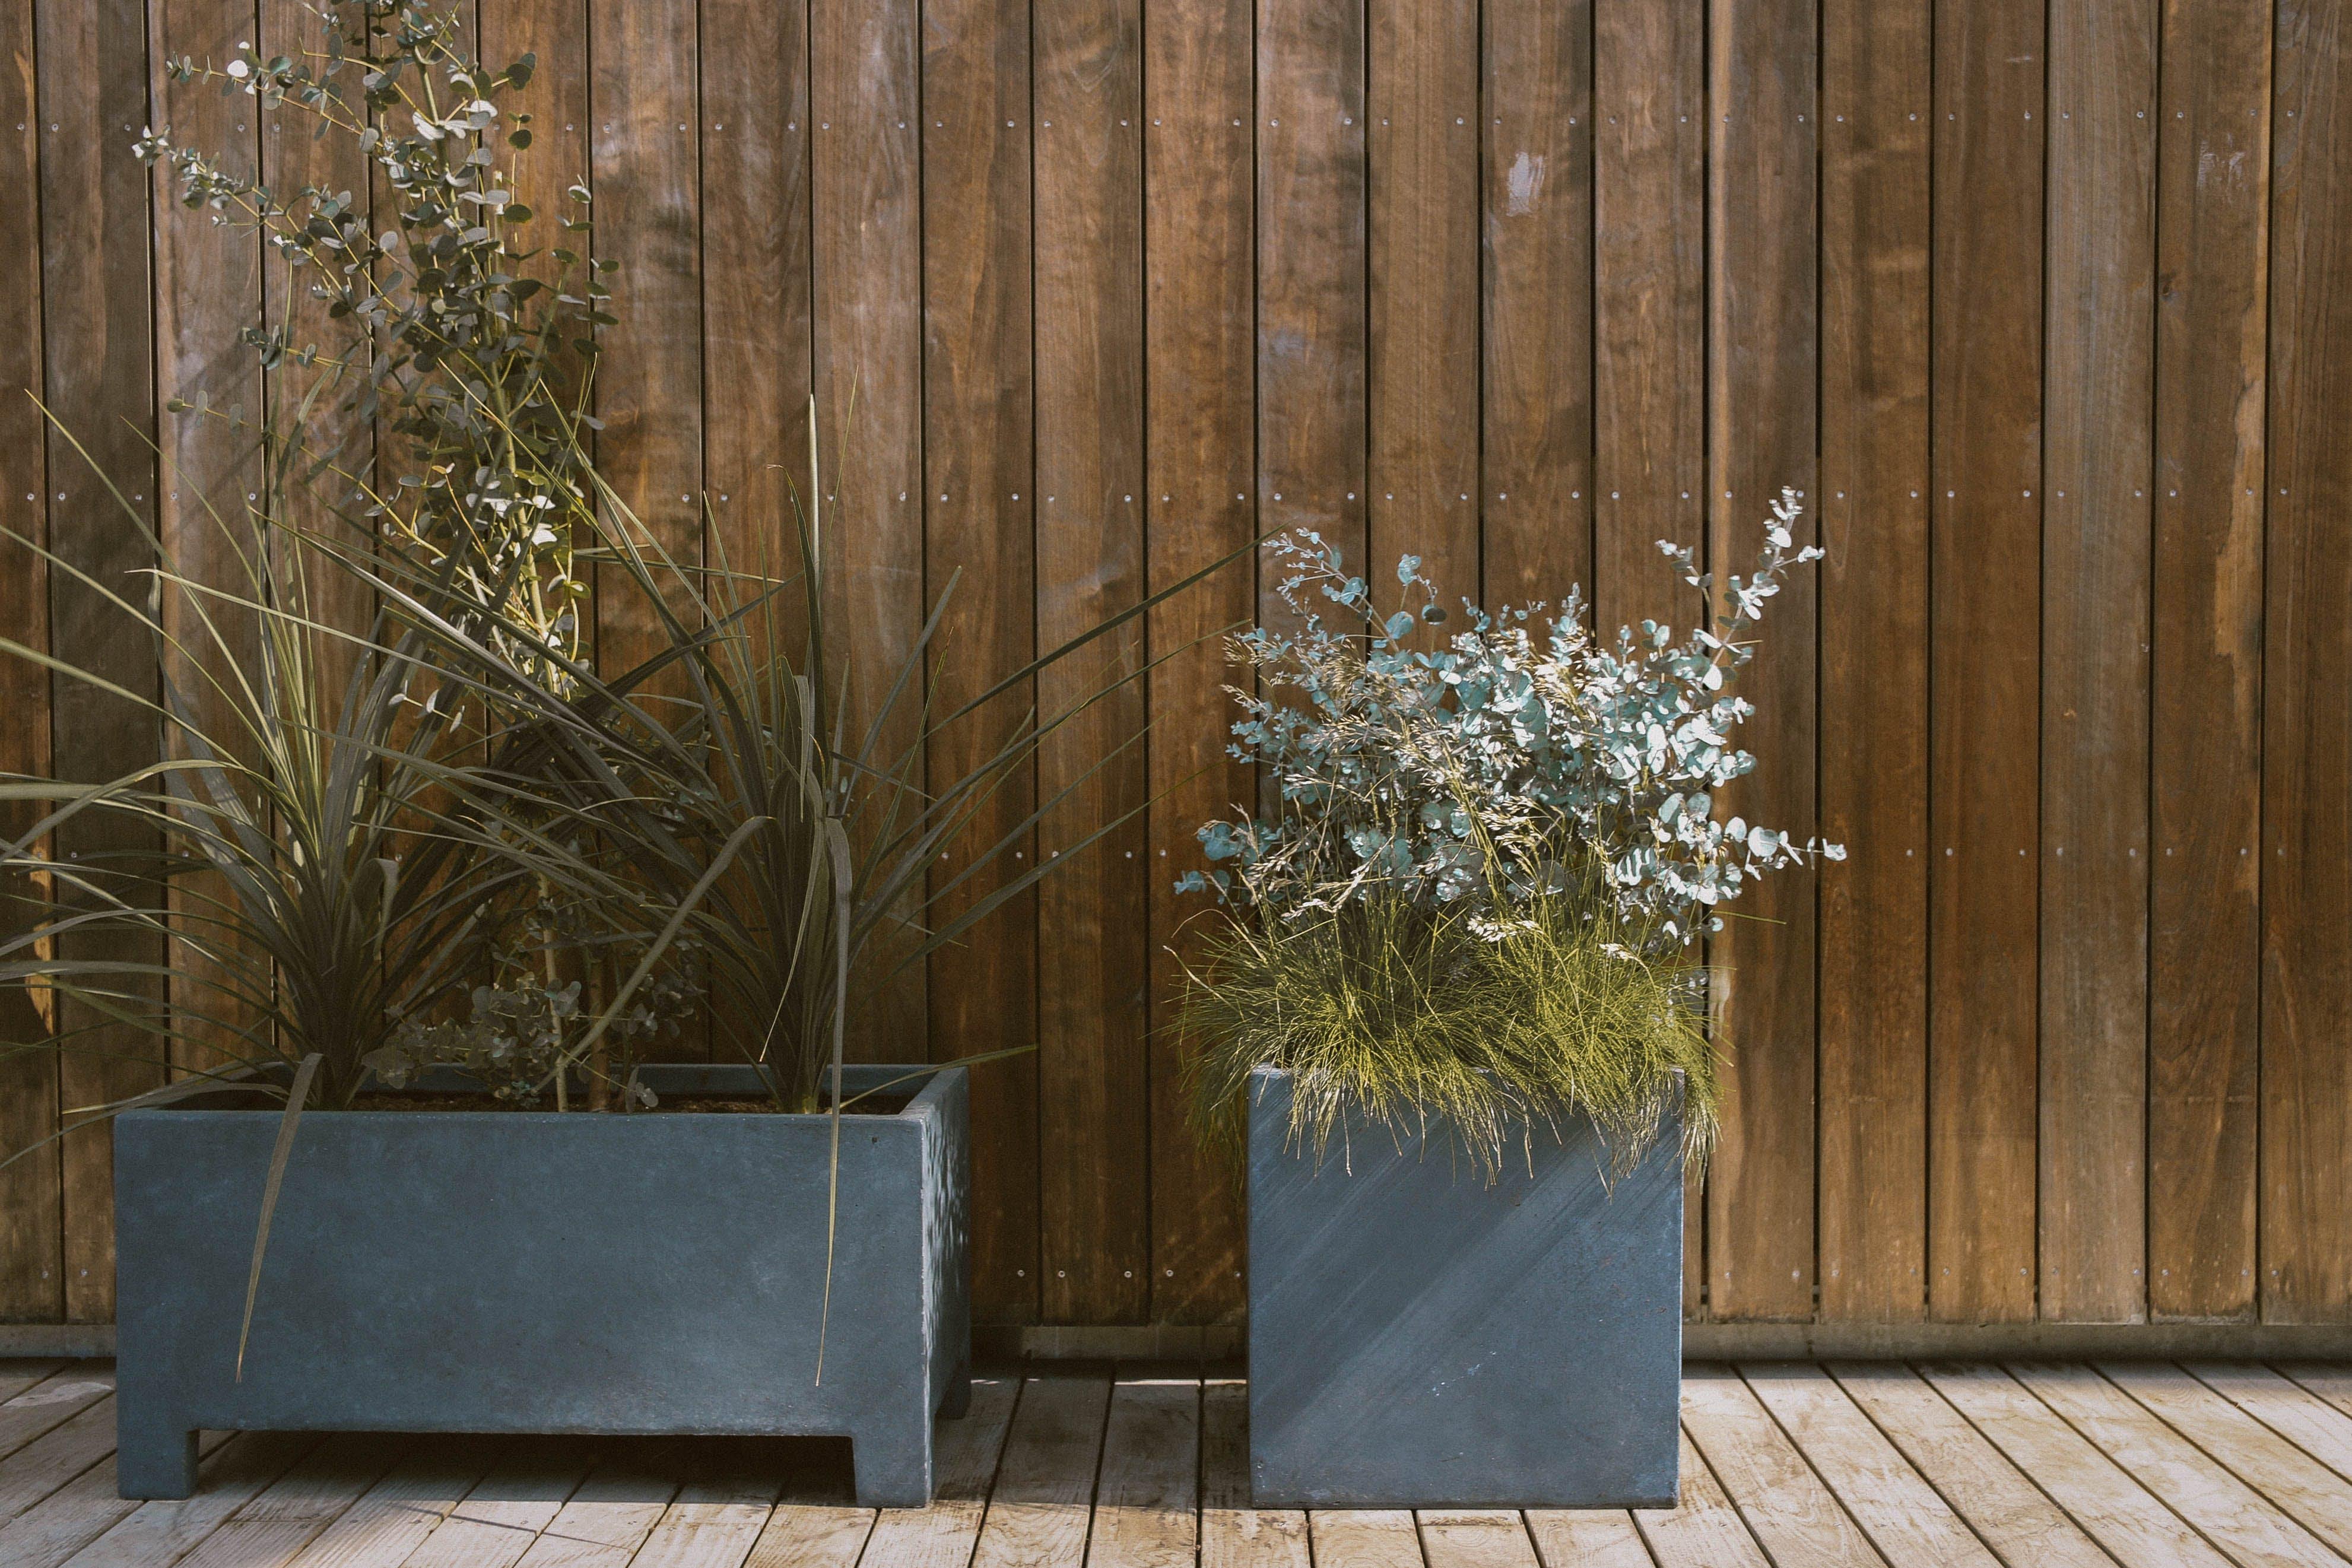 Green Plants in Gray Pot Beside Brown Wooden Wall